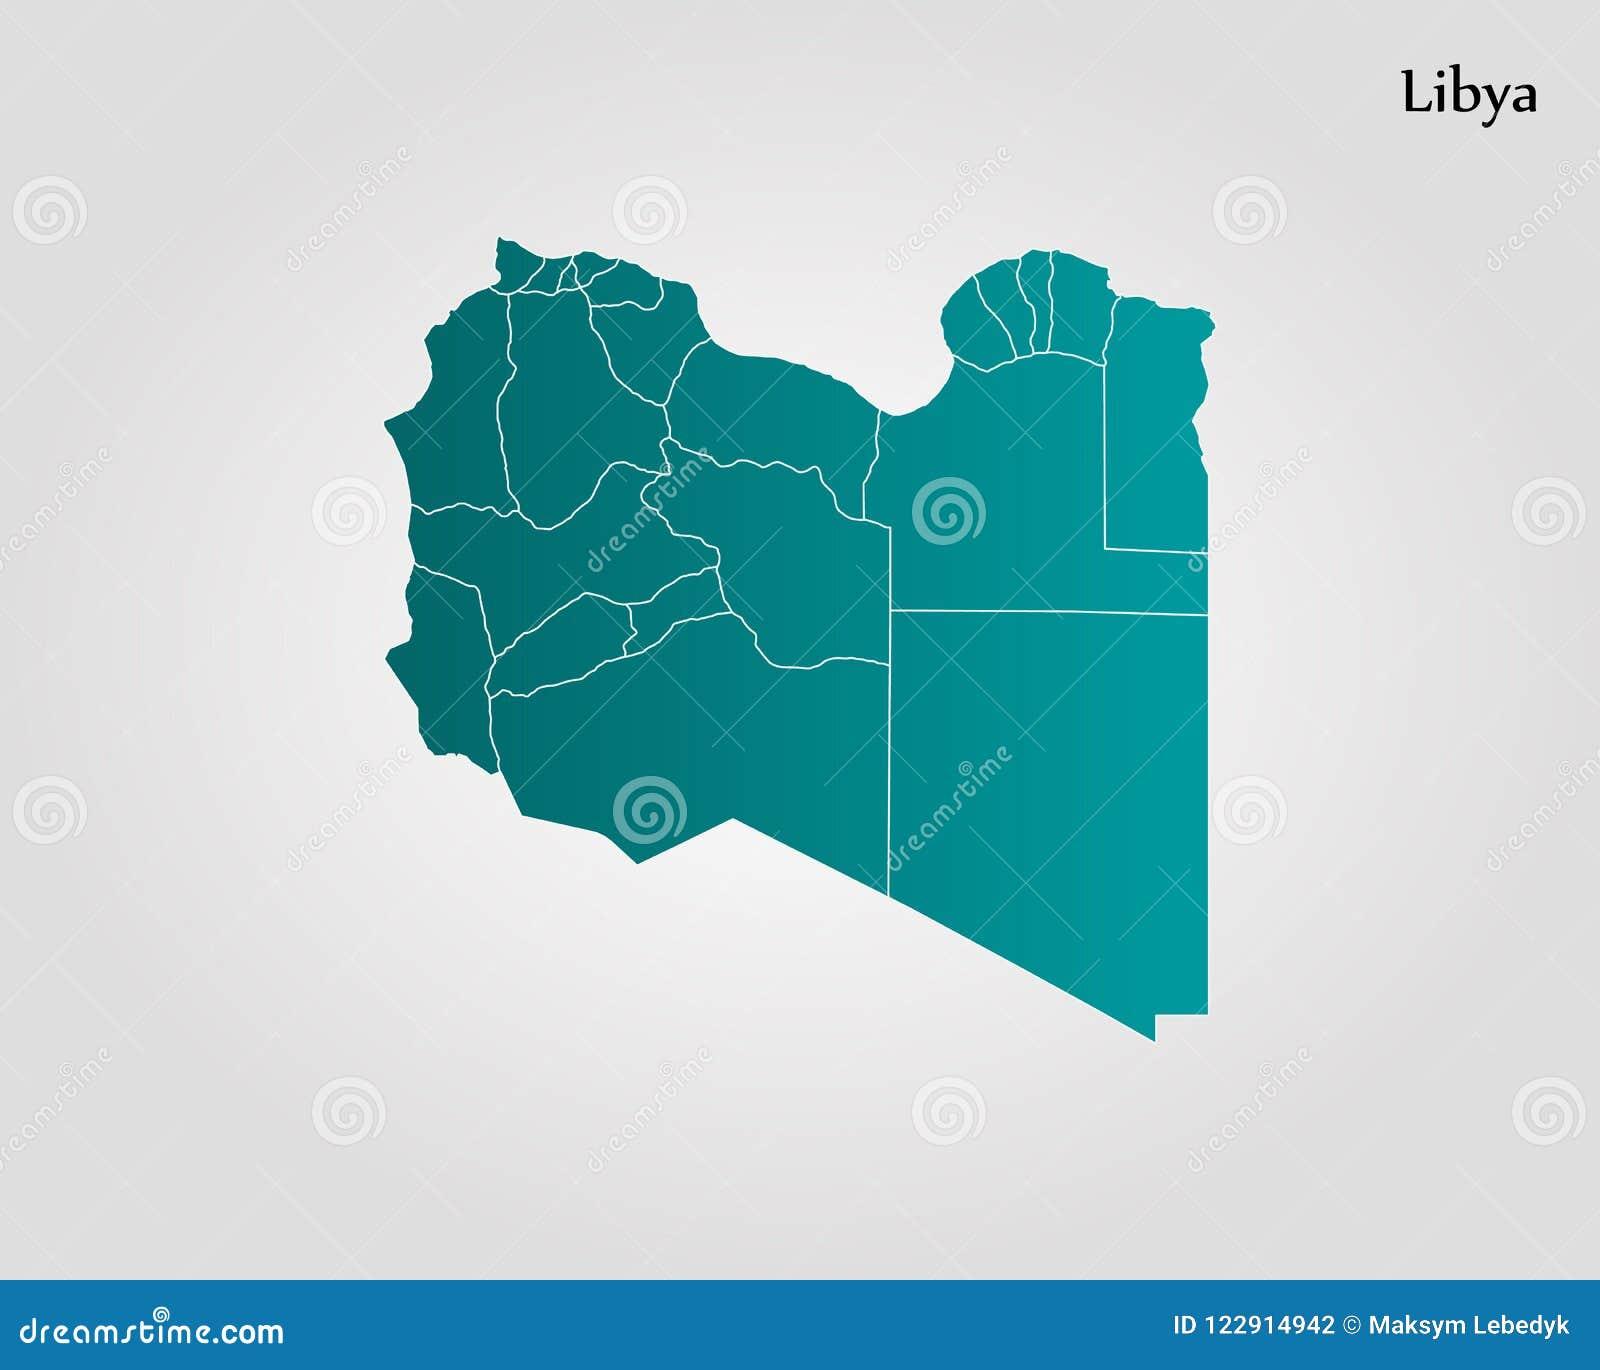 Libya On A World Map.Map Of Libya Stock Illustration Illustration Of Line 122914942